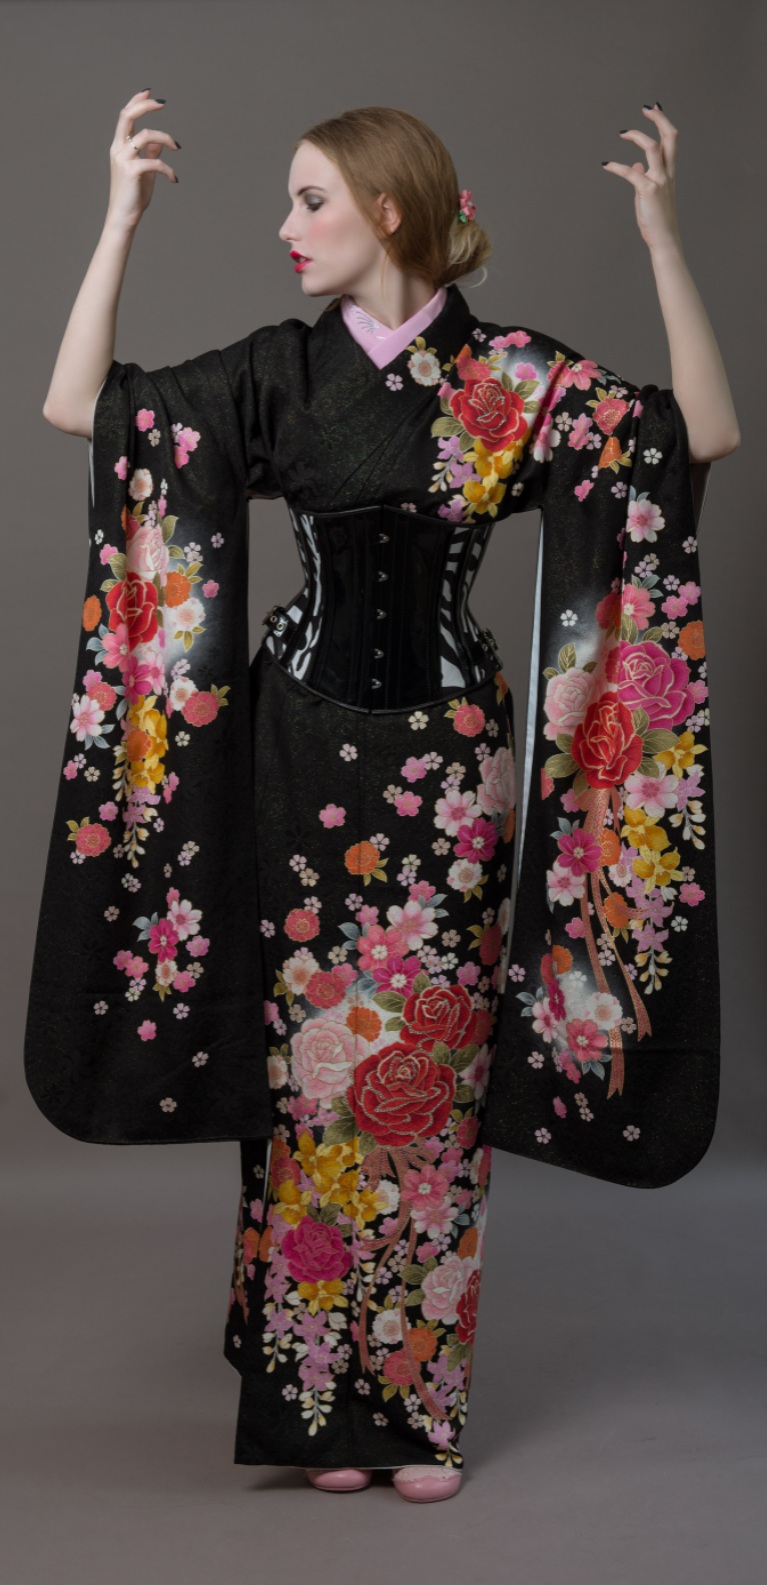 I command you! / Stylist Kimono Stylist, Designer Kimono Stylist / Uploaded 2nd August 2017 @ 07:17 PM